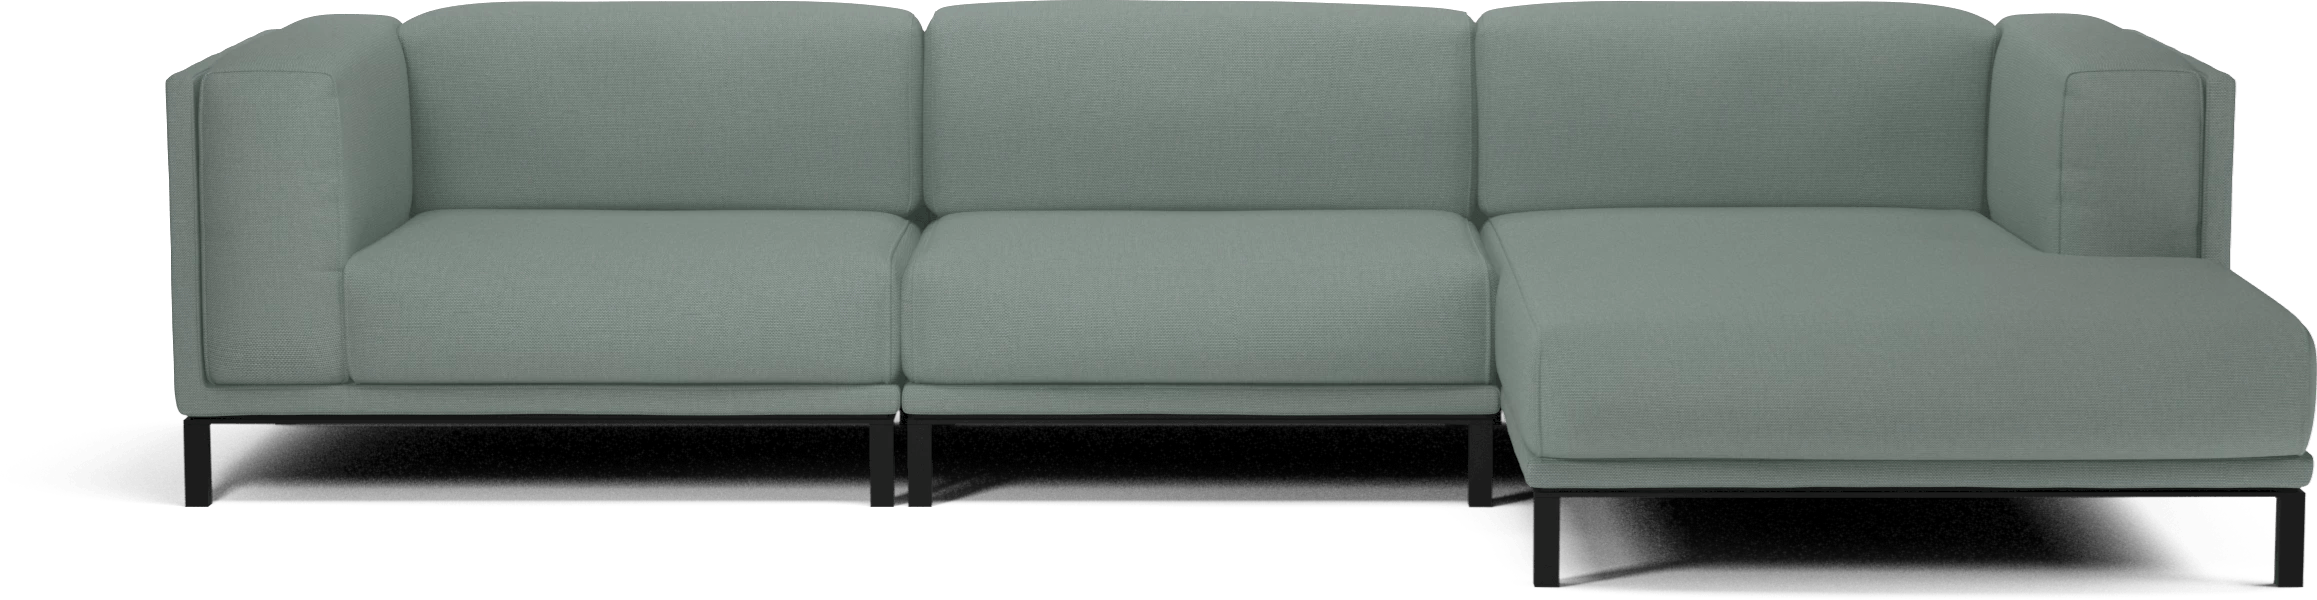 bolia light green cosy modular sofa haute living